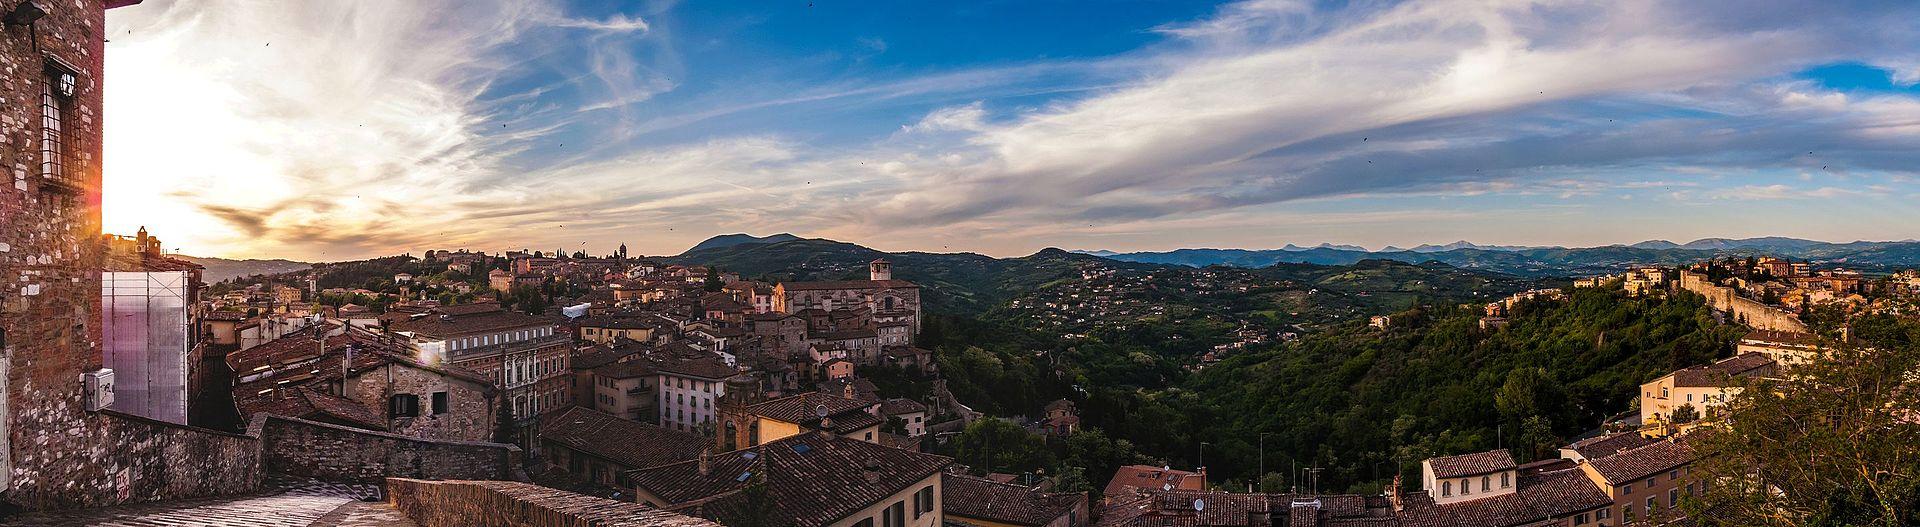 Perugia from Porta Sole.jpg